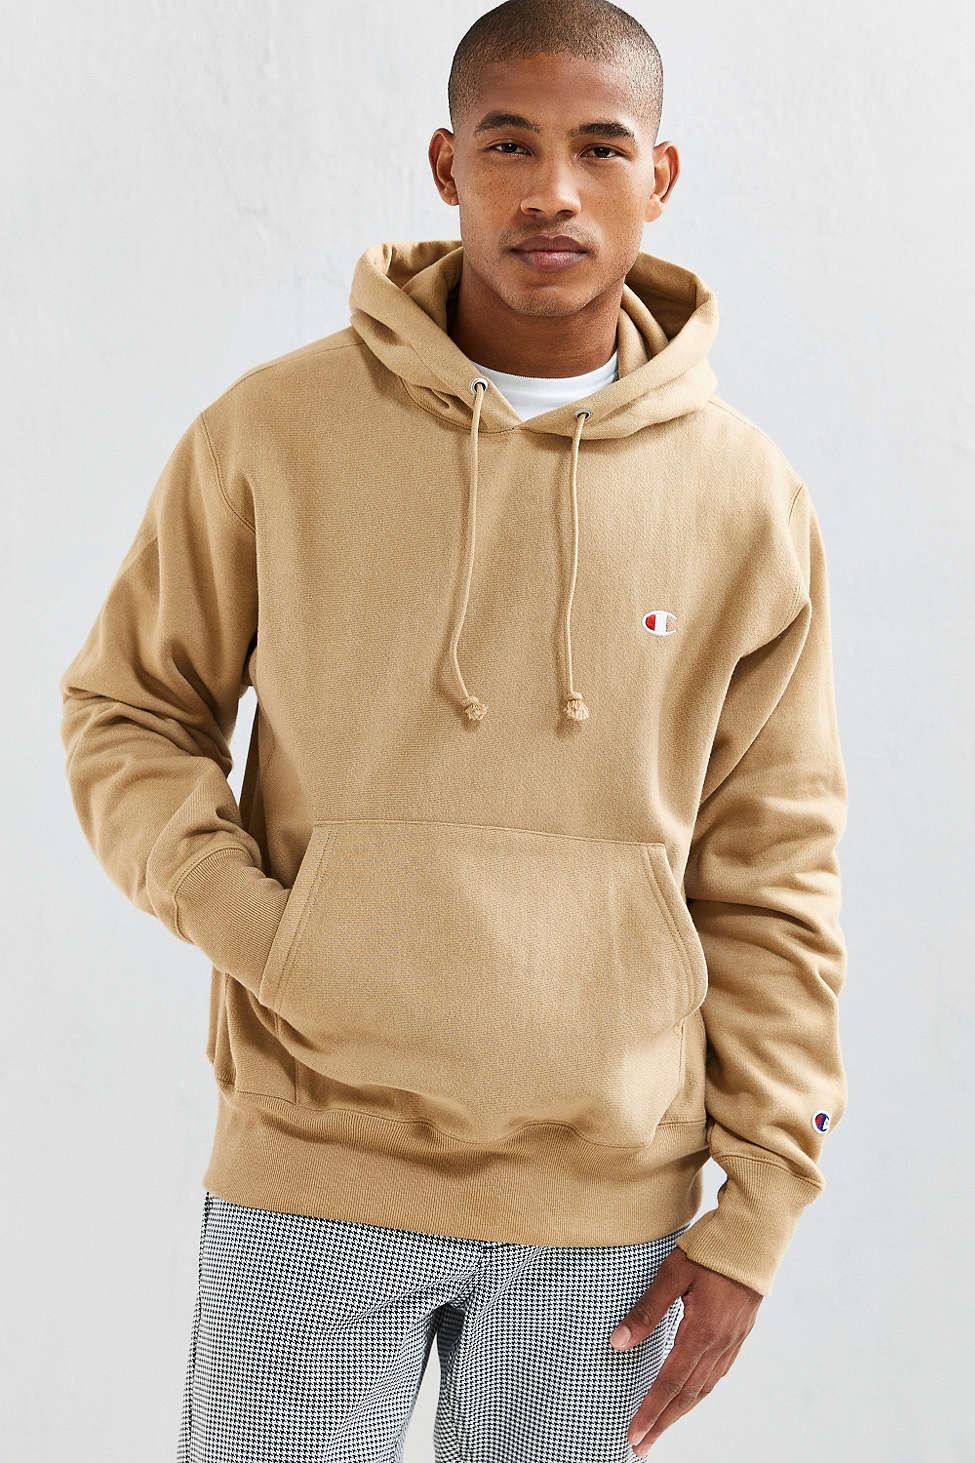 Weave Champion Reverse Outfitters Sweatshirt Hoodie Urban wt5RBaqB